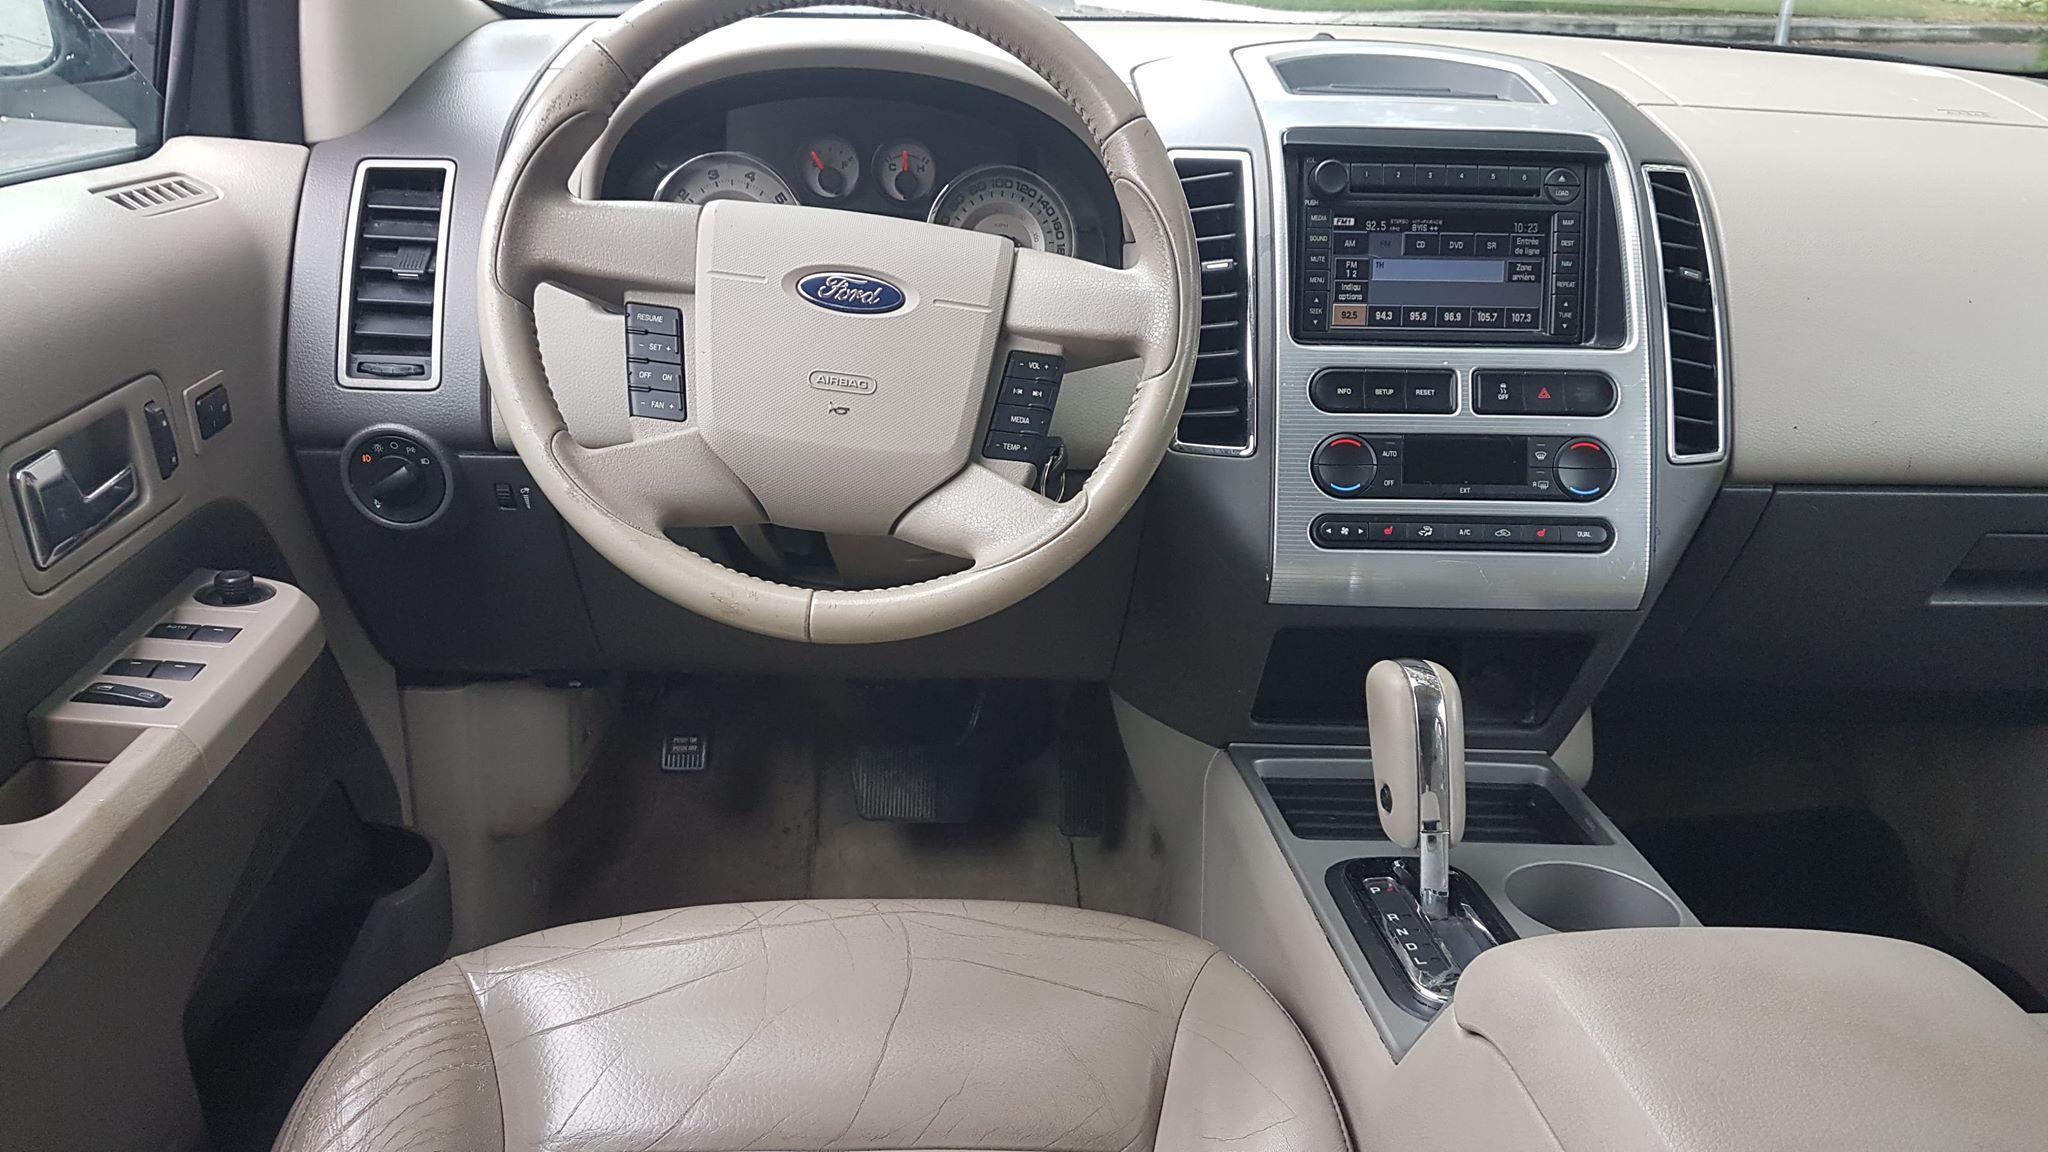 Ford Edge 2007 SEL 3.5L V6 4WD cuir , dvd, nav 5995$